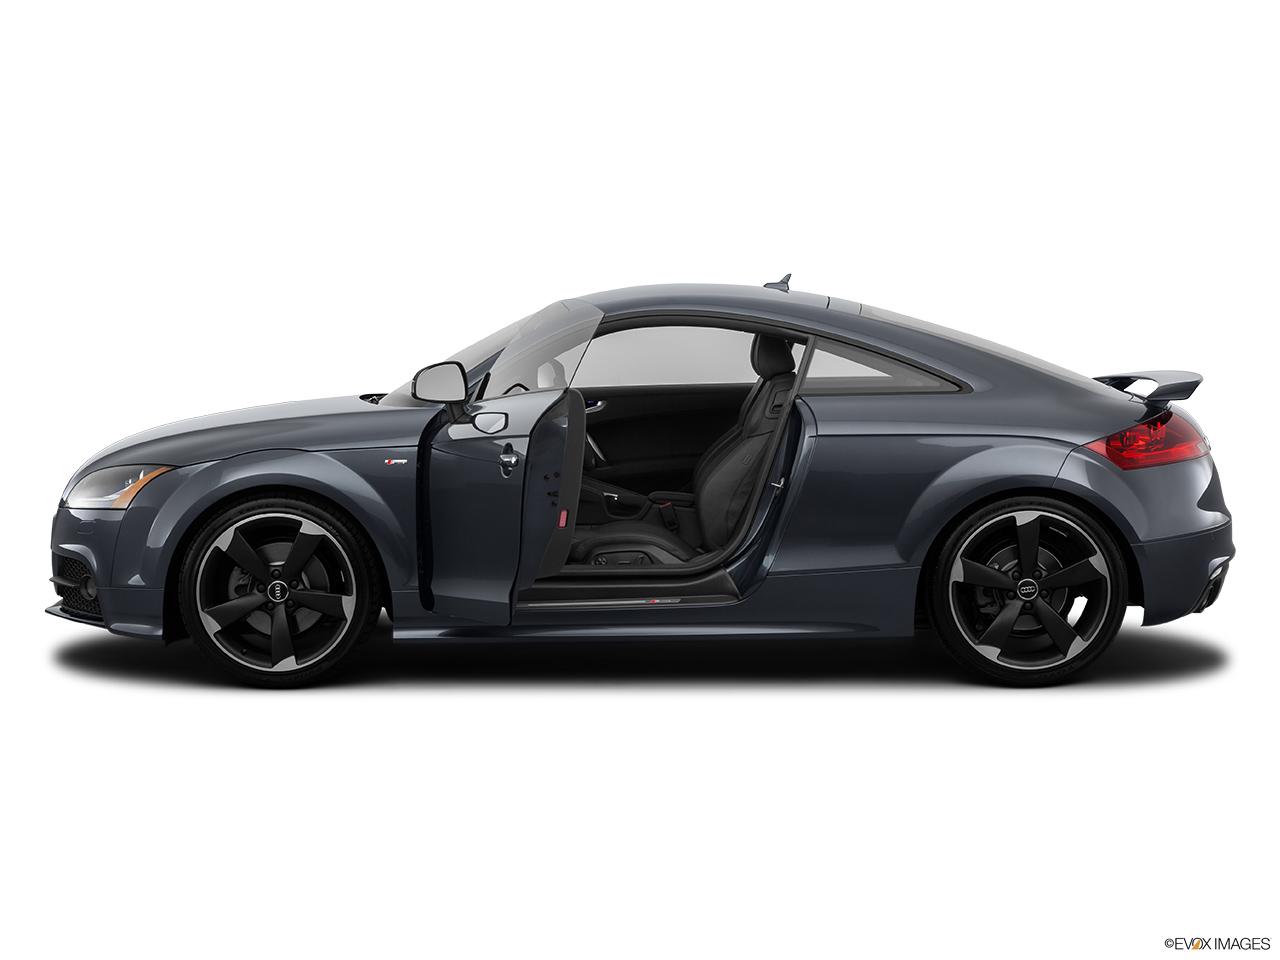 2015 Audi Tt Coupe S Tronic Quattro 2 0t Driver S Side